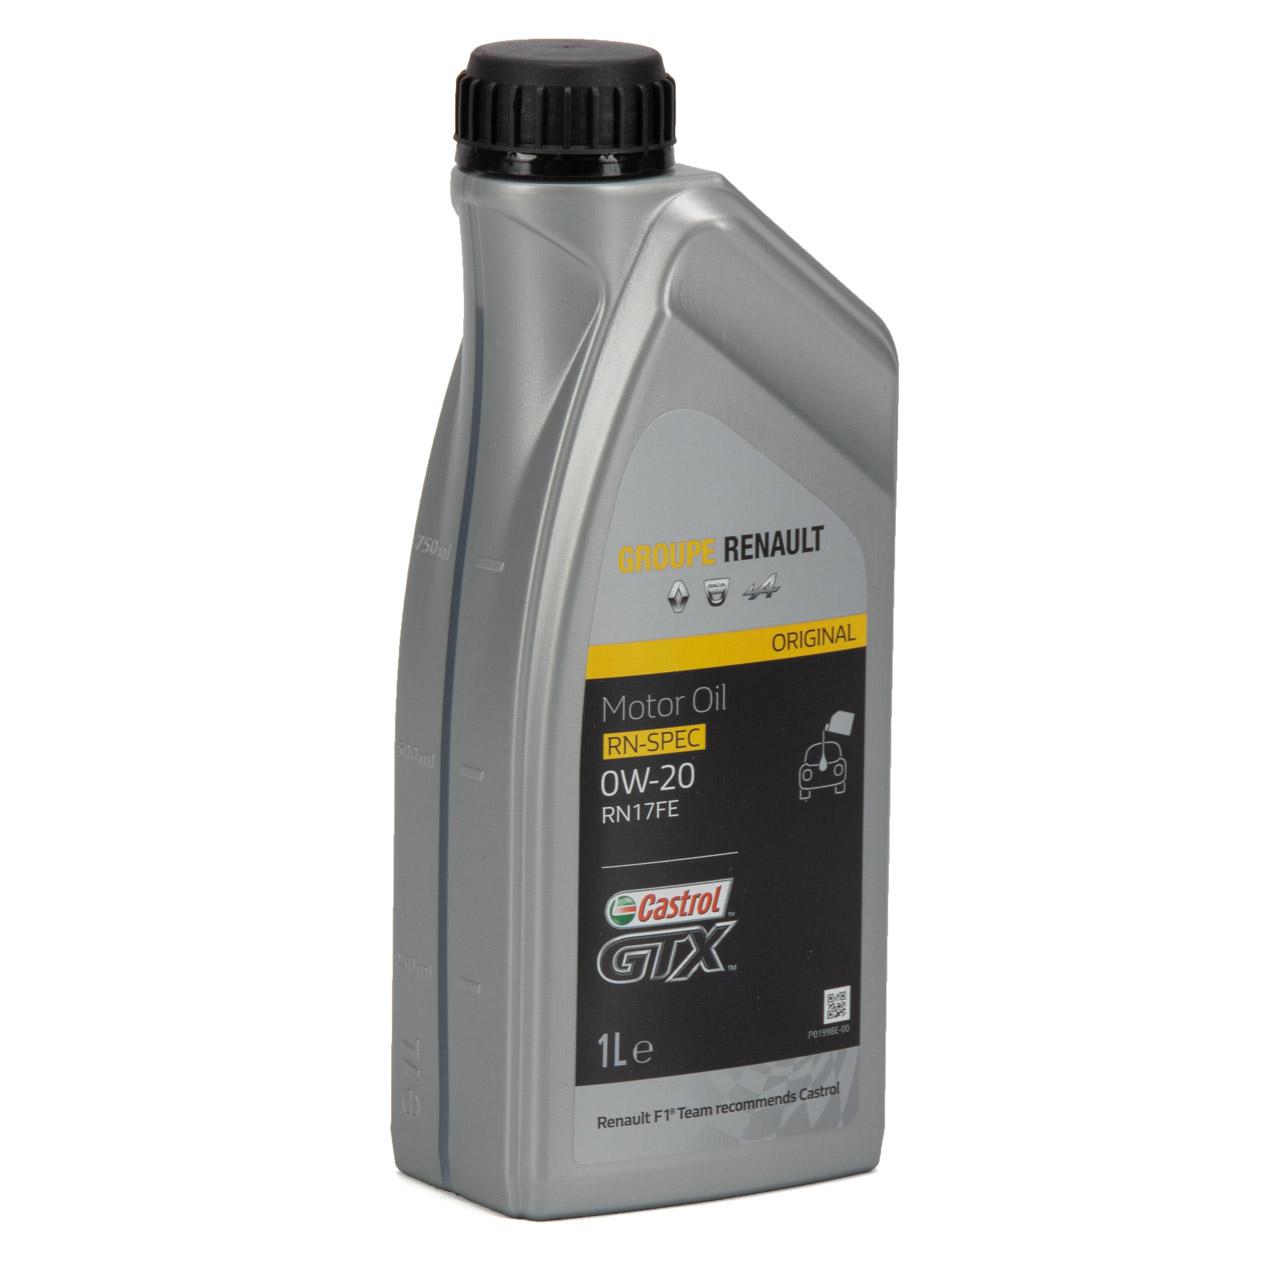 CASTROL Motoröl Öl GTX RN-SPEC 0W-20 0W20 für Renault RN17FE - 1L 1 Liter